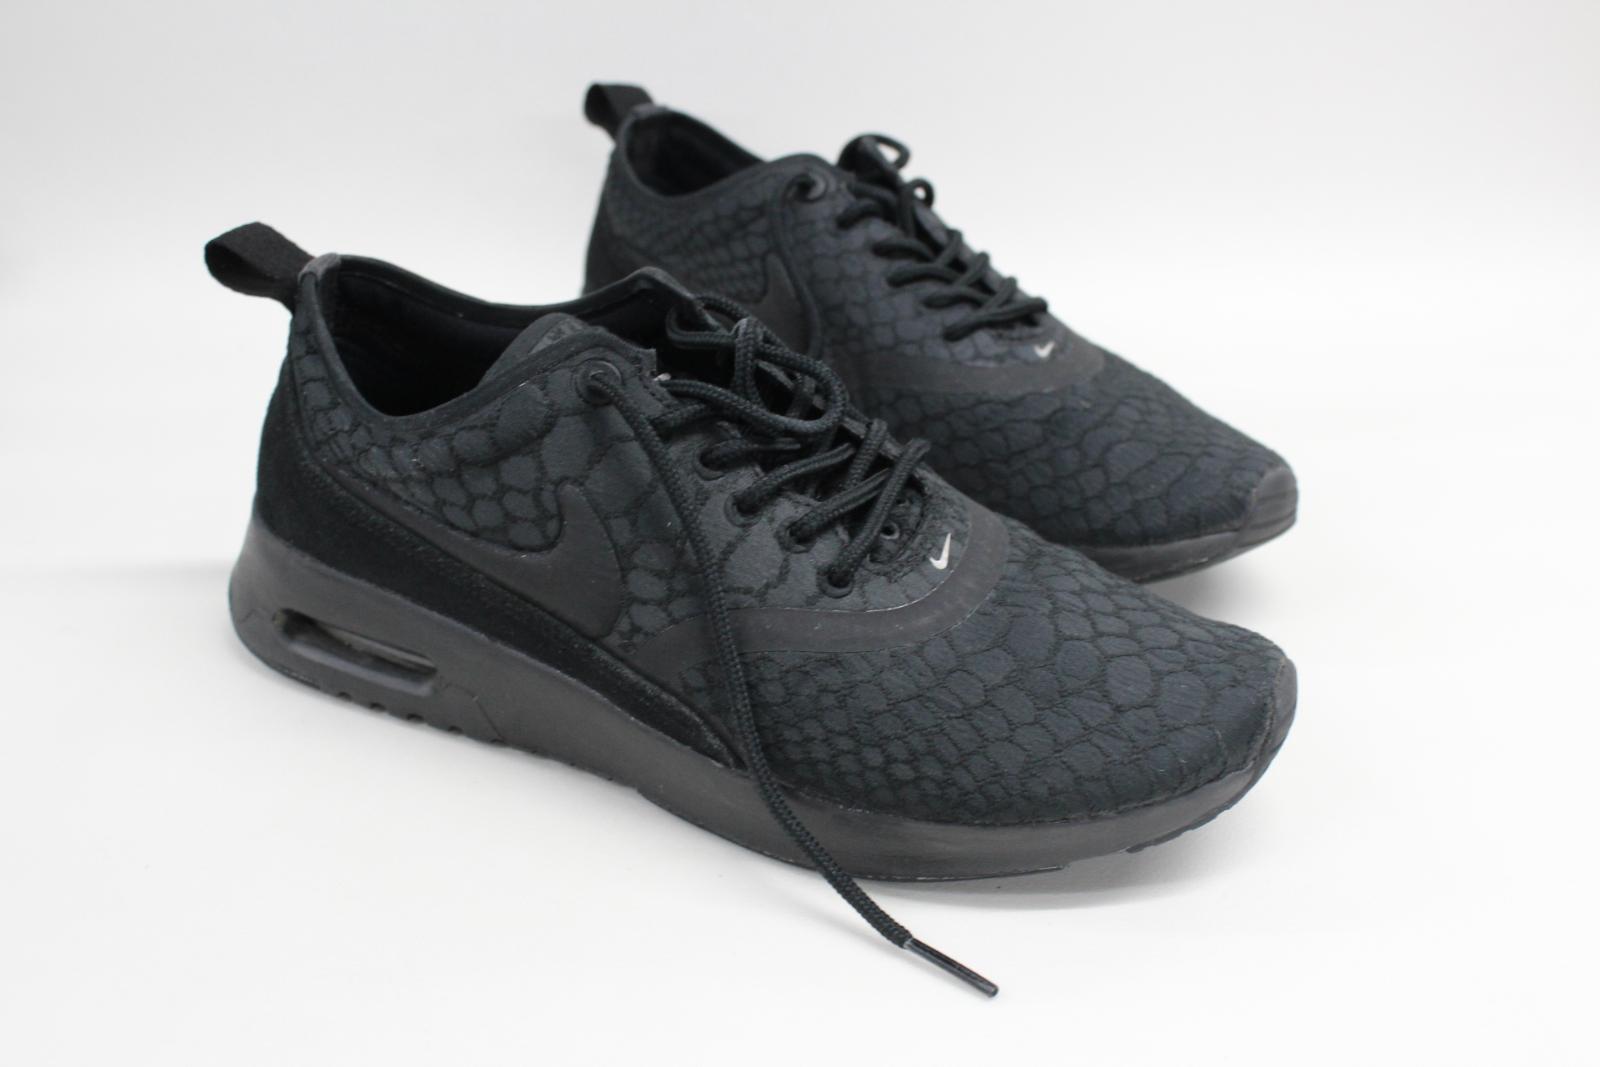 Nike-Air-Max-Thea-Ultra-Femmes-Baskets-noir-sportswear-Taille-UK4-5-EU38 miniature 2